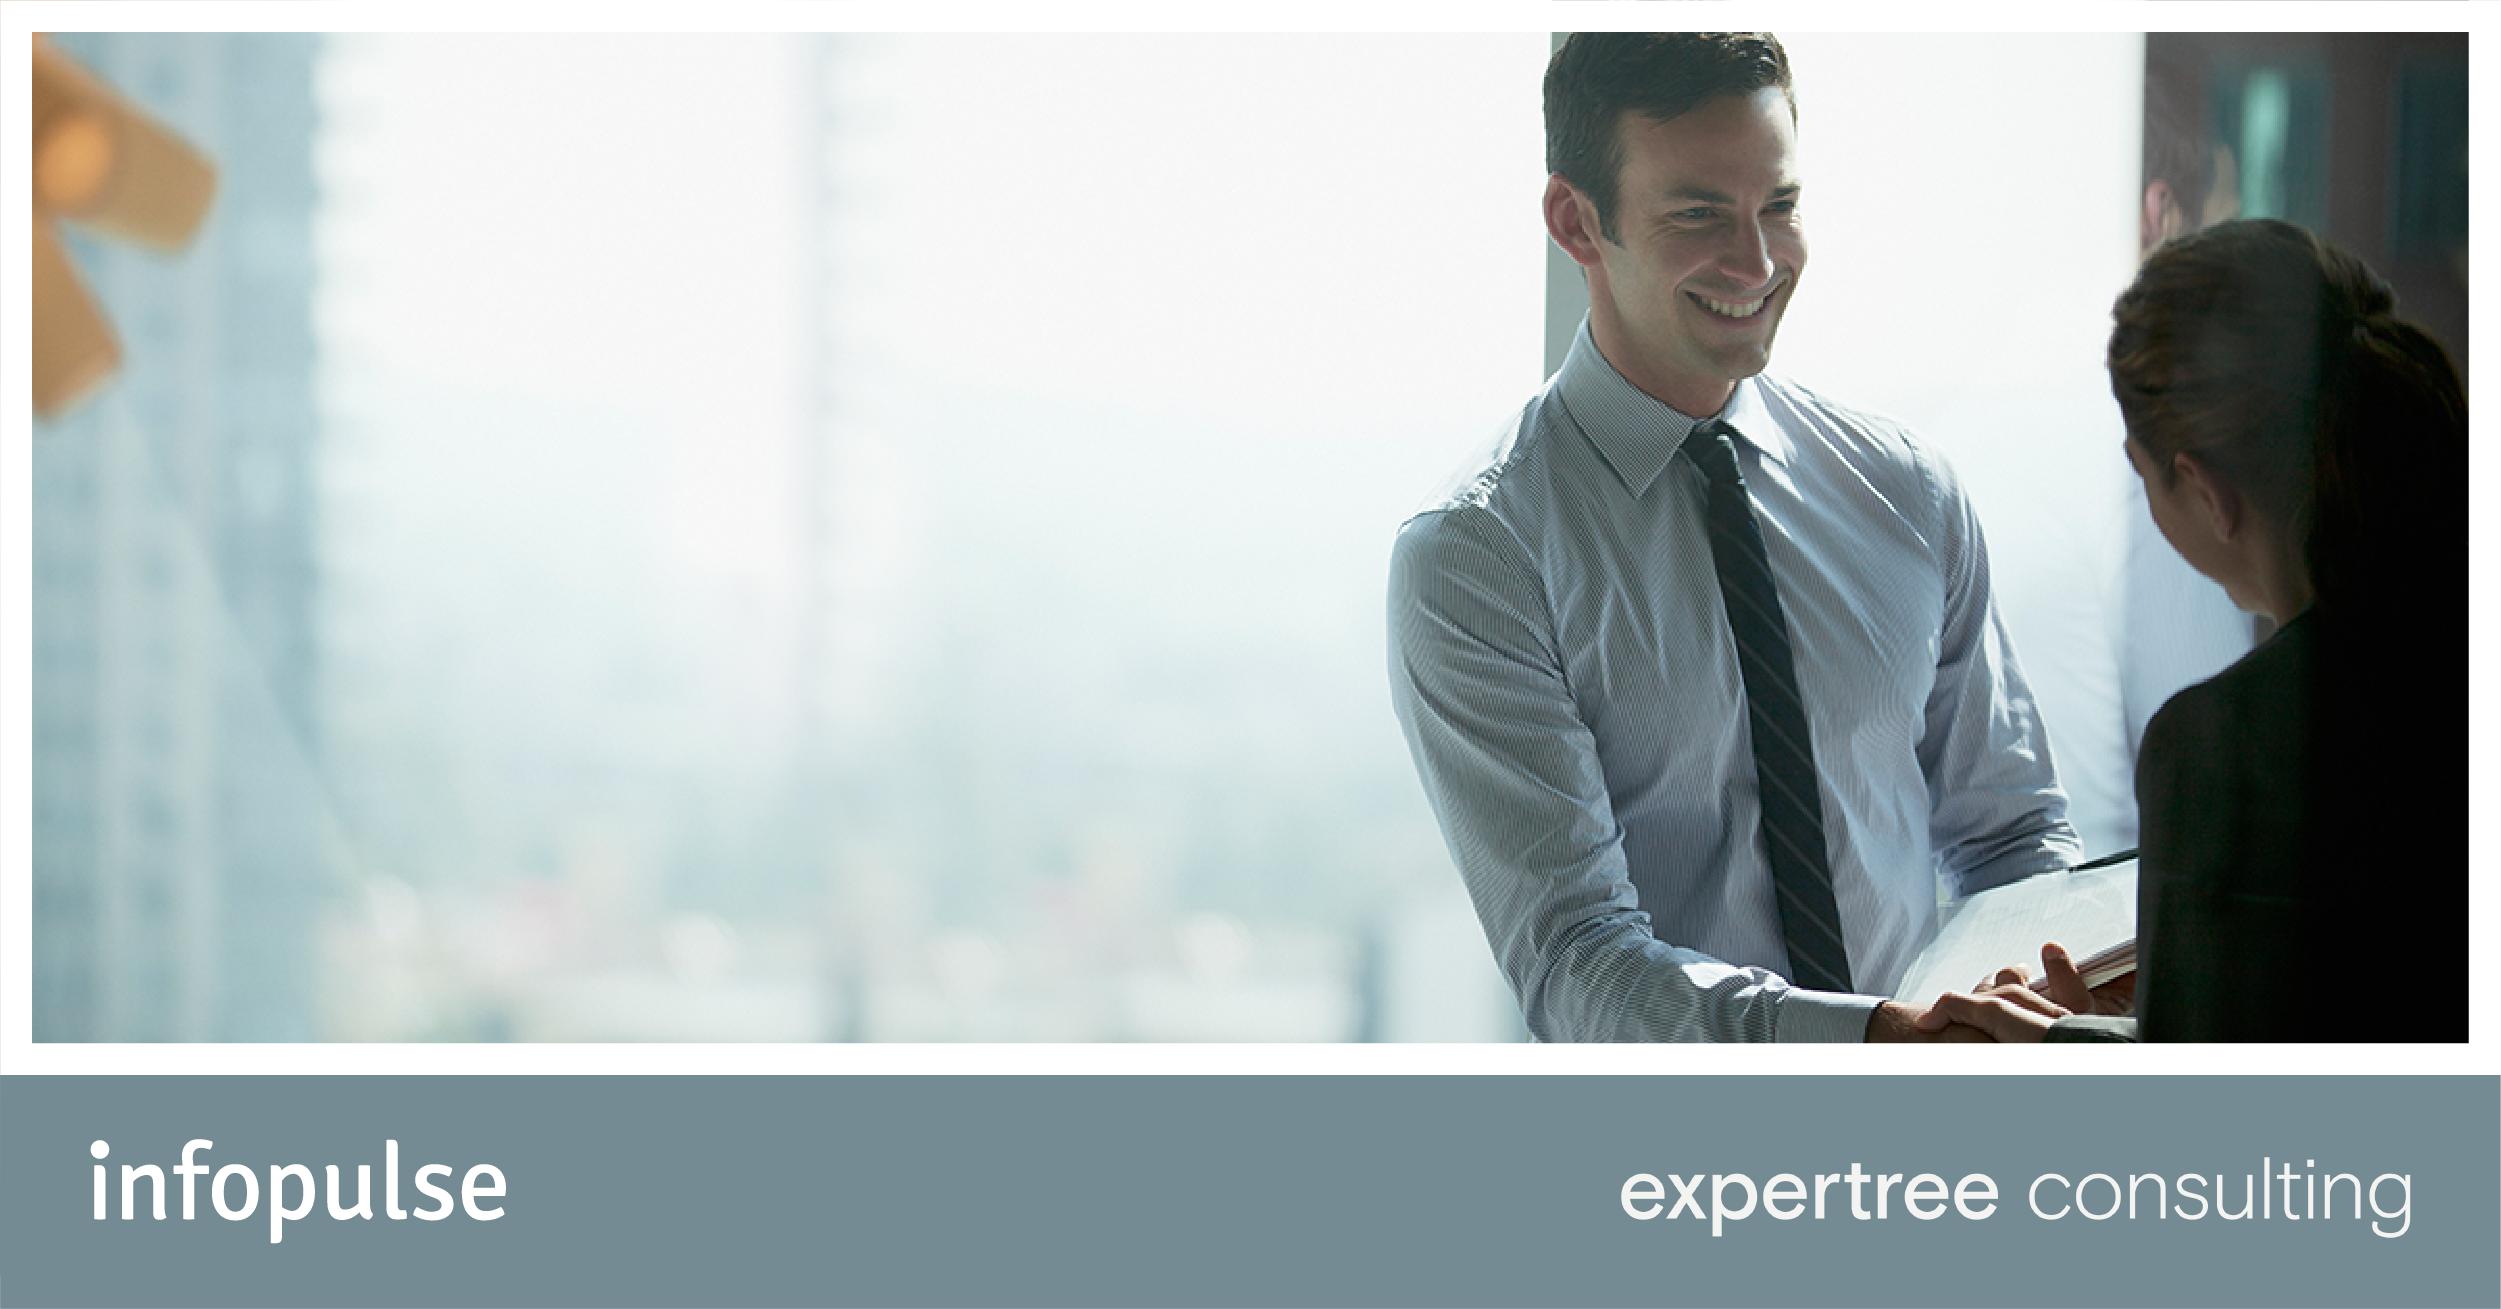 infopulse expertree consulting partnerschaft